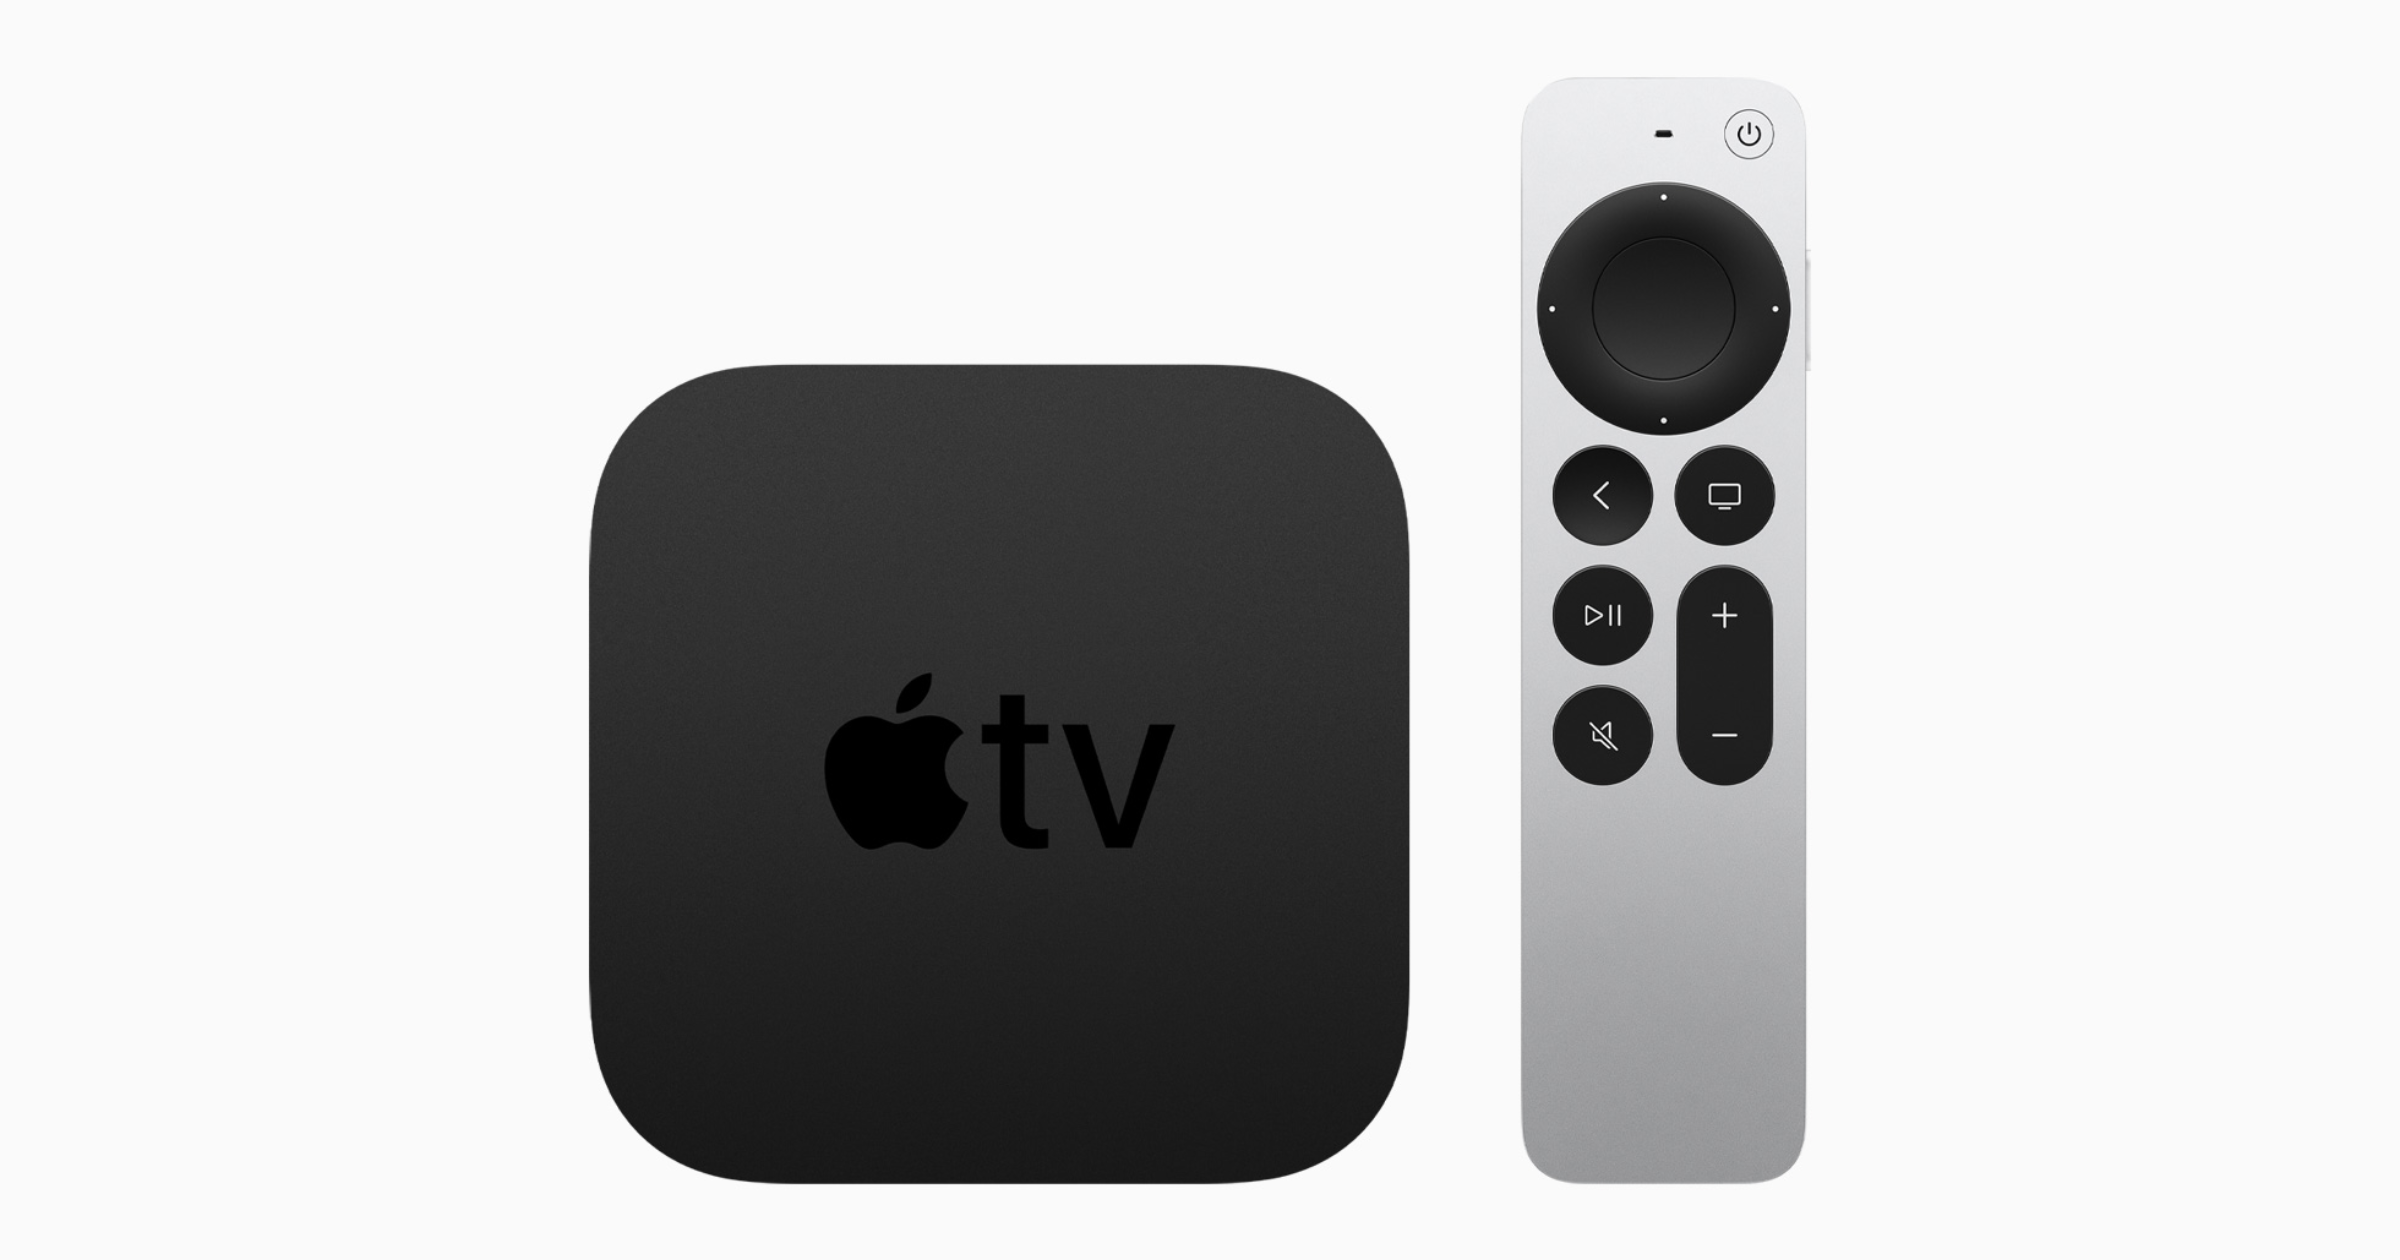 New Apple TV 4K Siri Remote